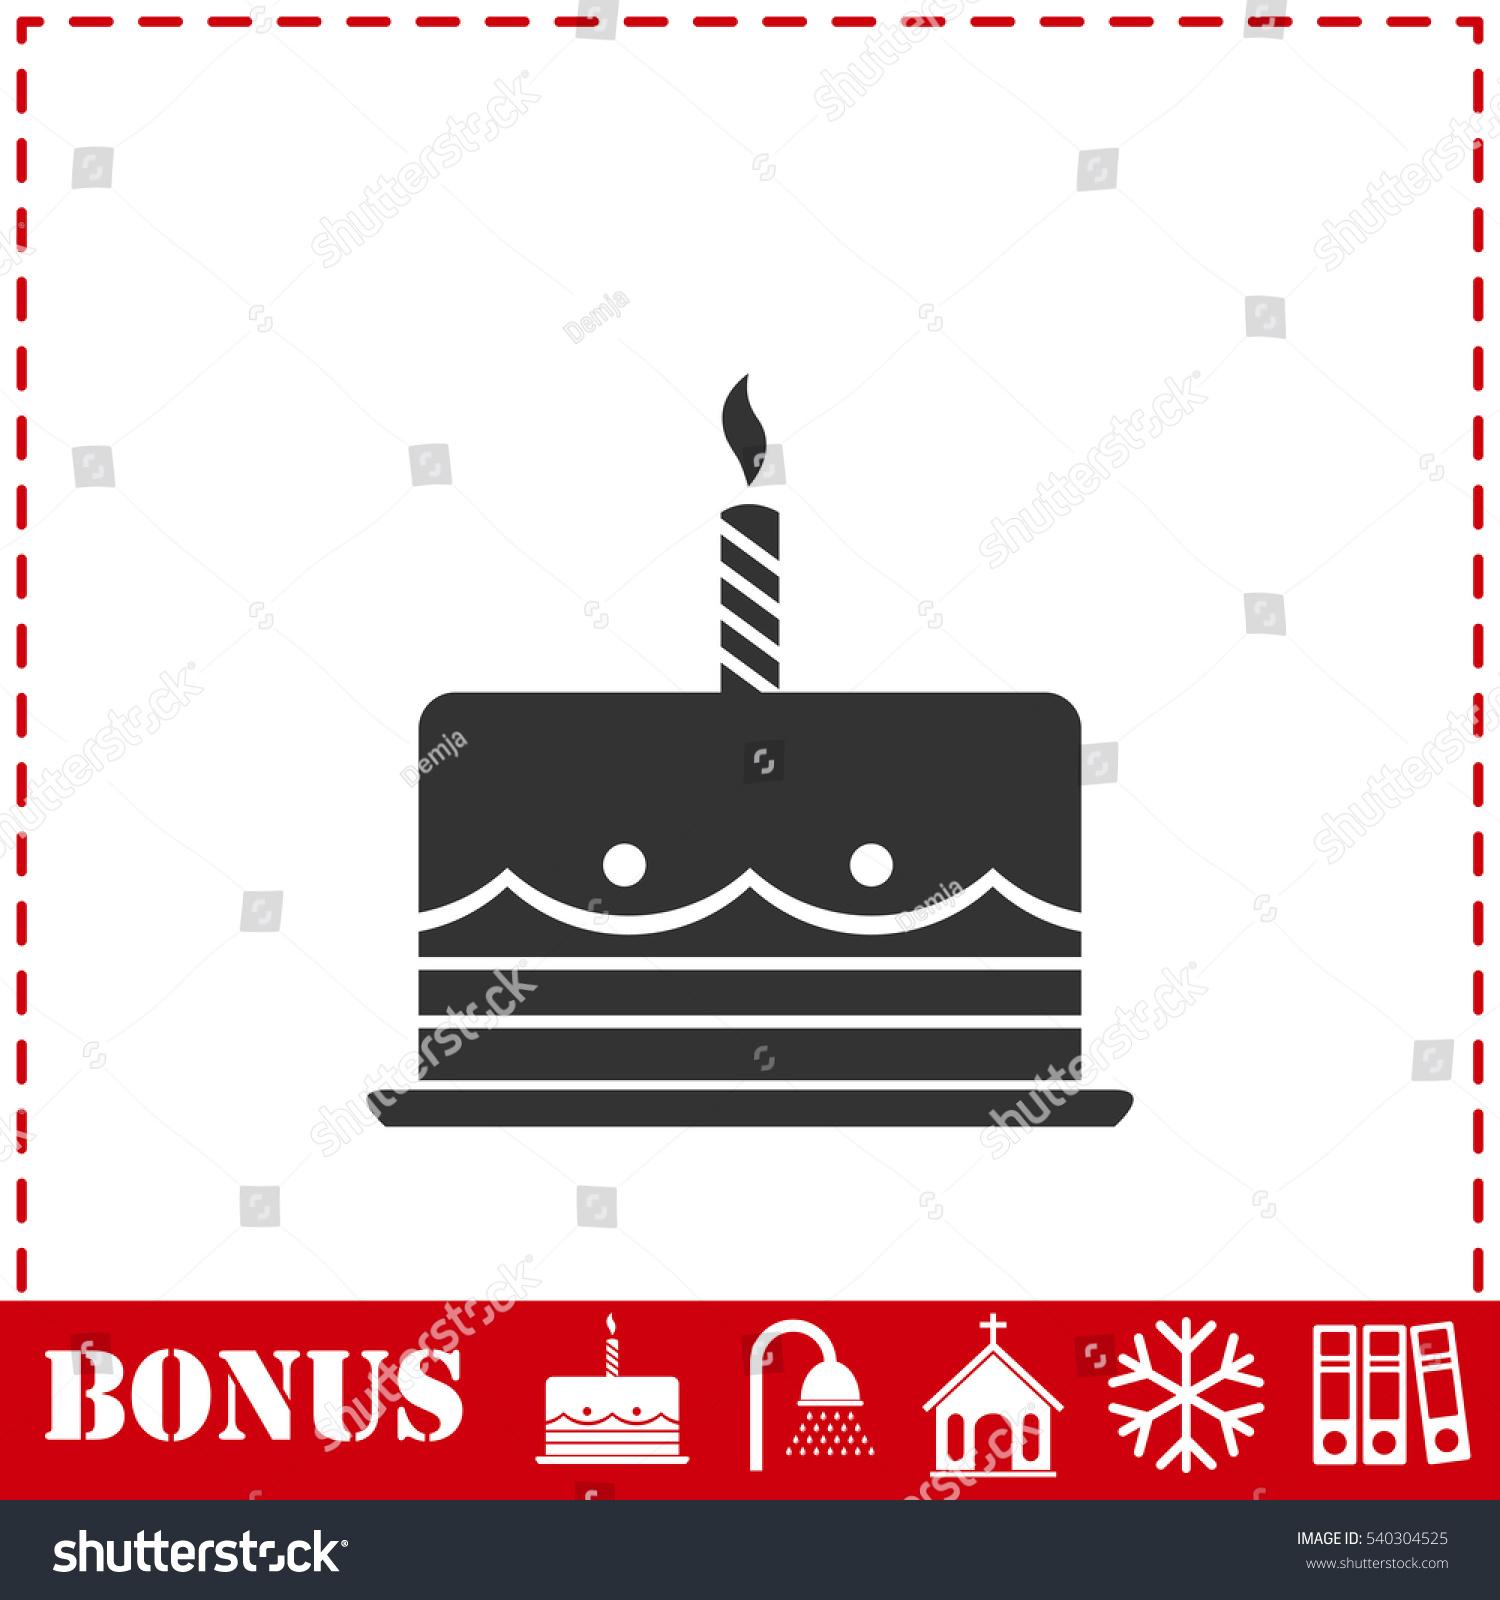 Birthday cake icon flat simple vector stock vector 540304525 birthday cake icon flat simple vector stock vector 540304525 shutterstock biocorpaavc